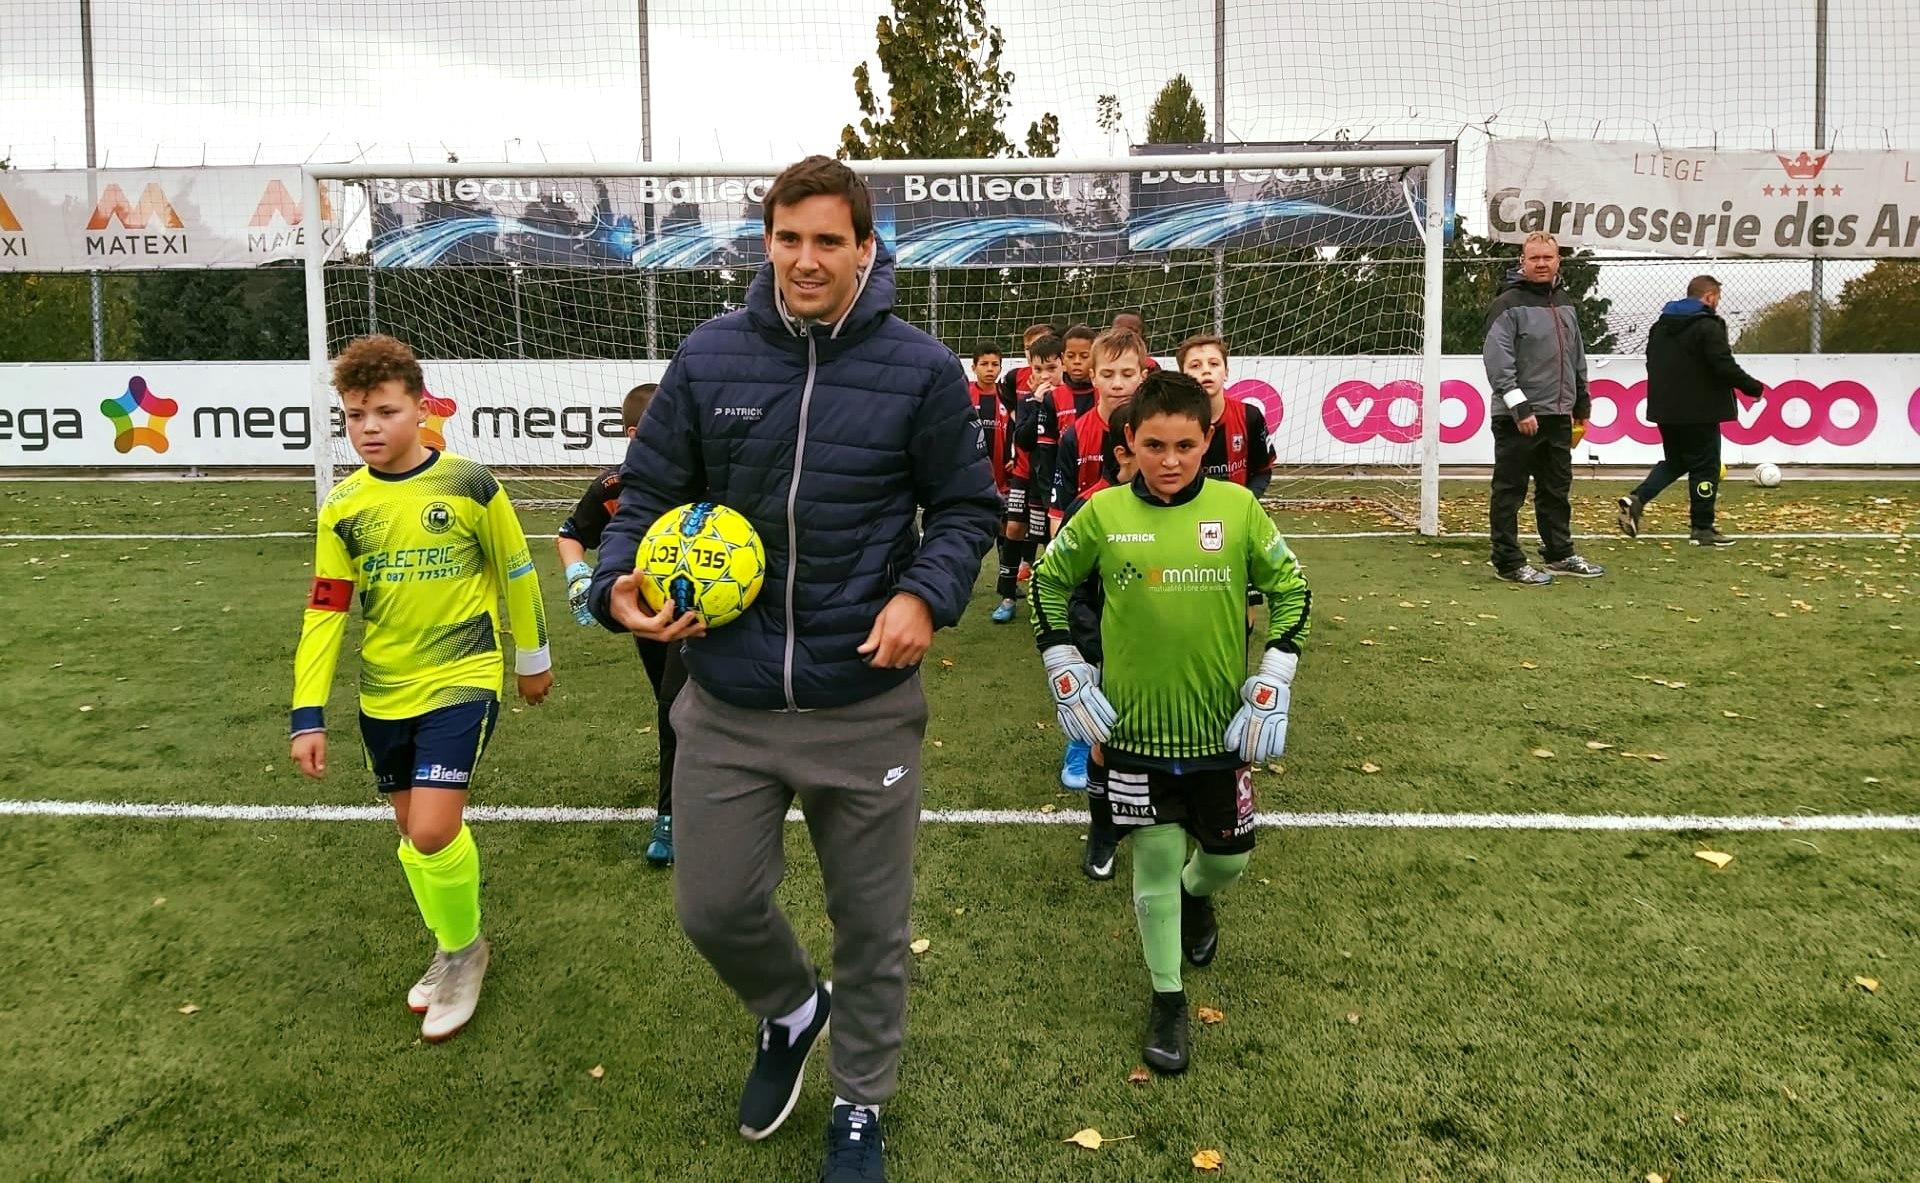 Fair-play   Teruel et Drouguet arbitres